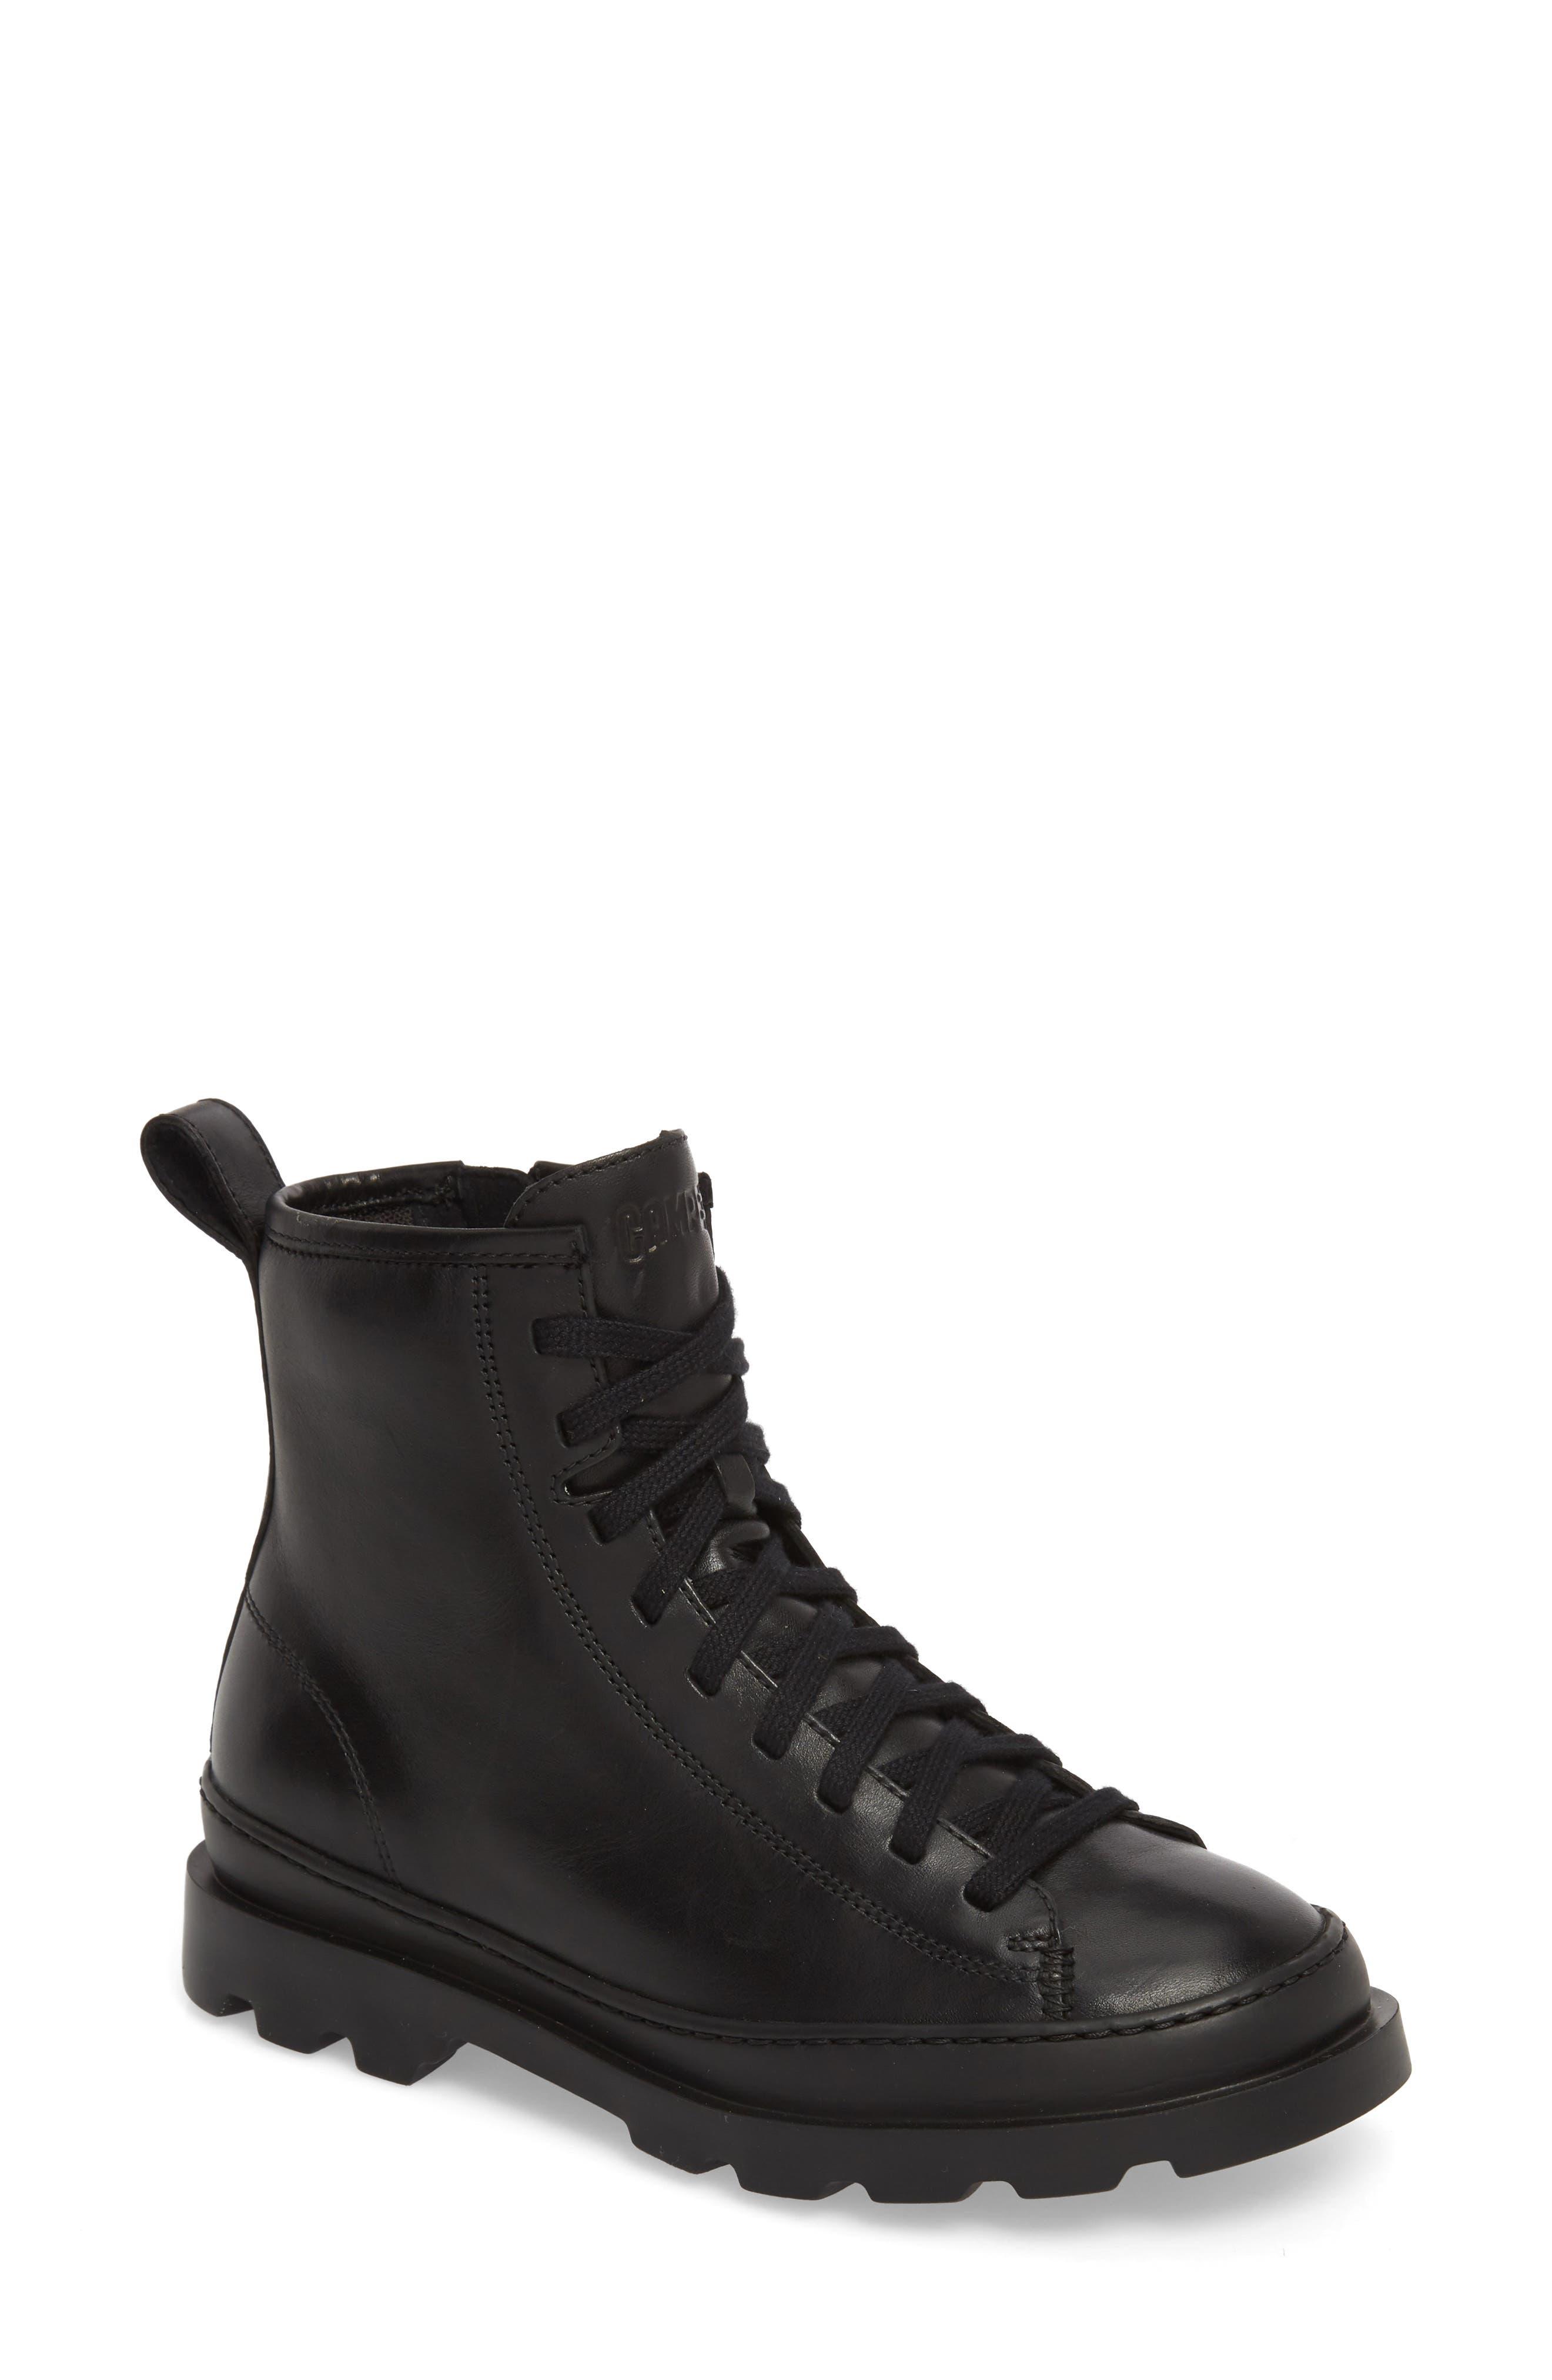 Brutus Combat Boot,                             Main thumbnail 1, color,                             BLACK LEATHER